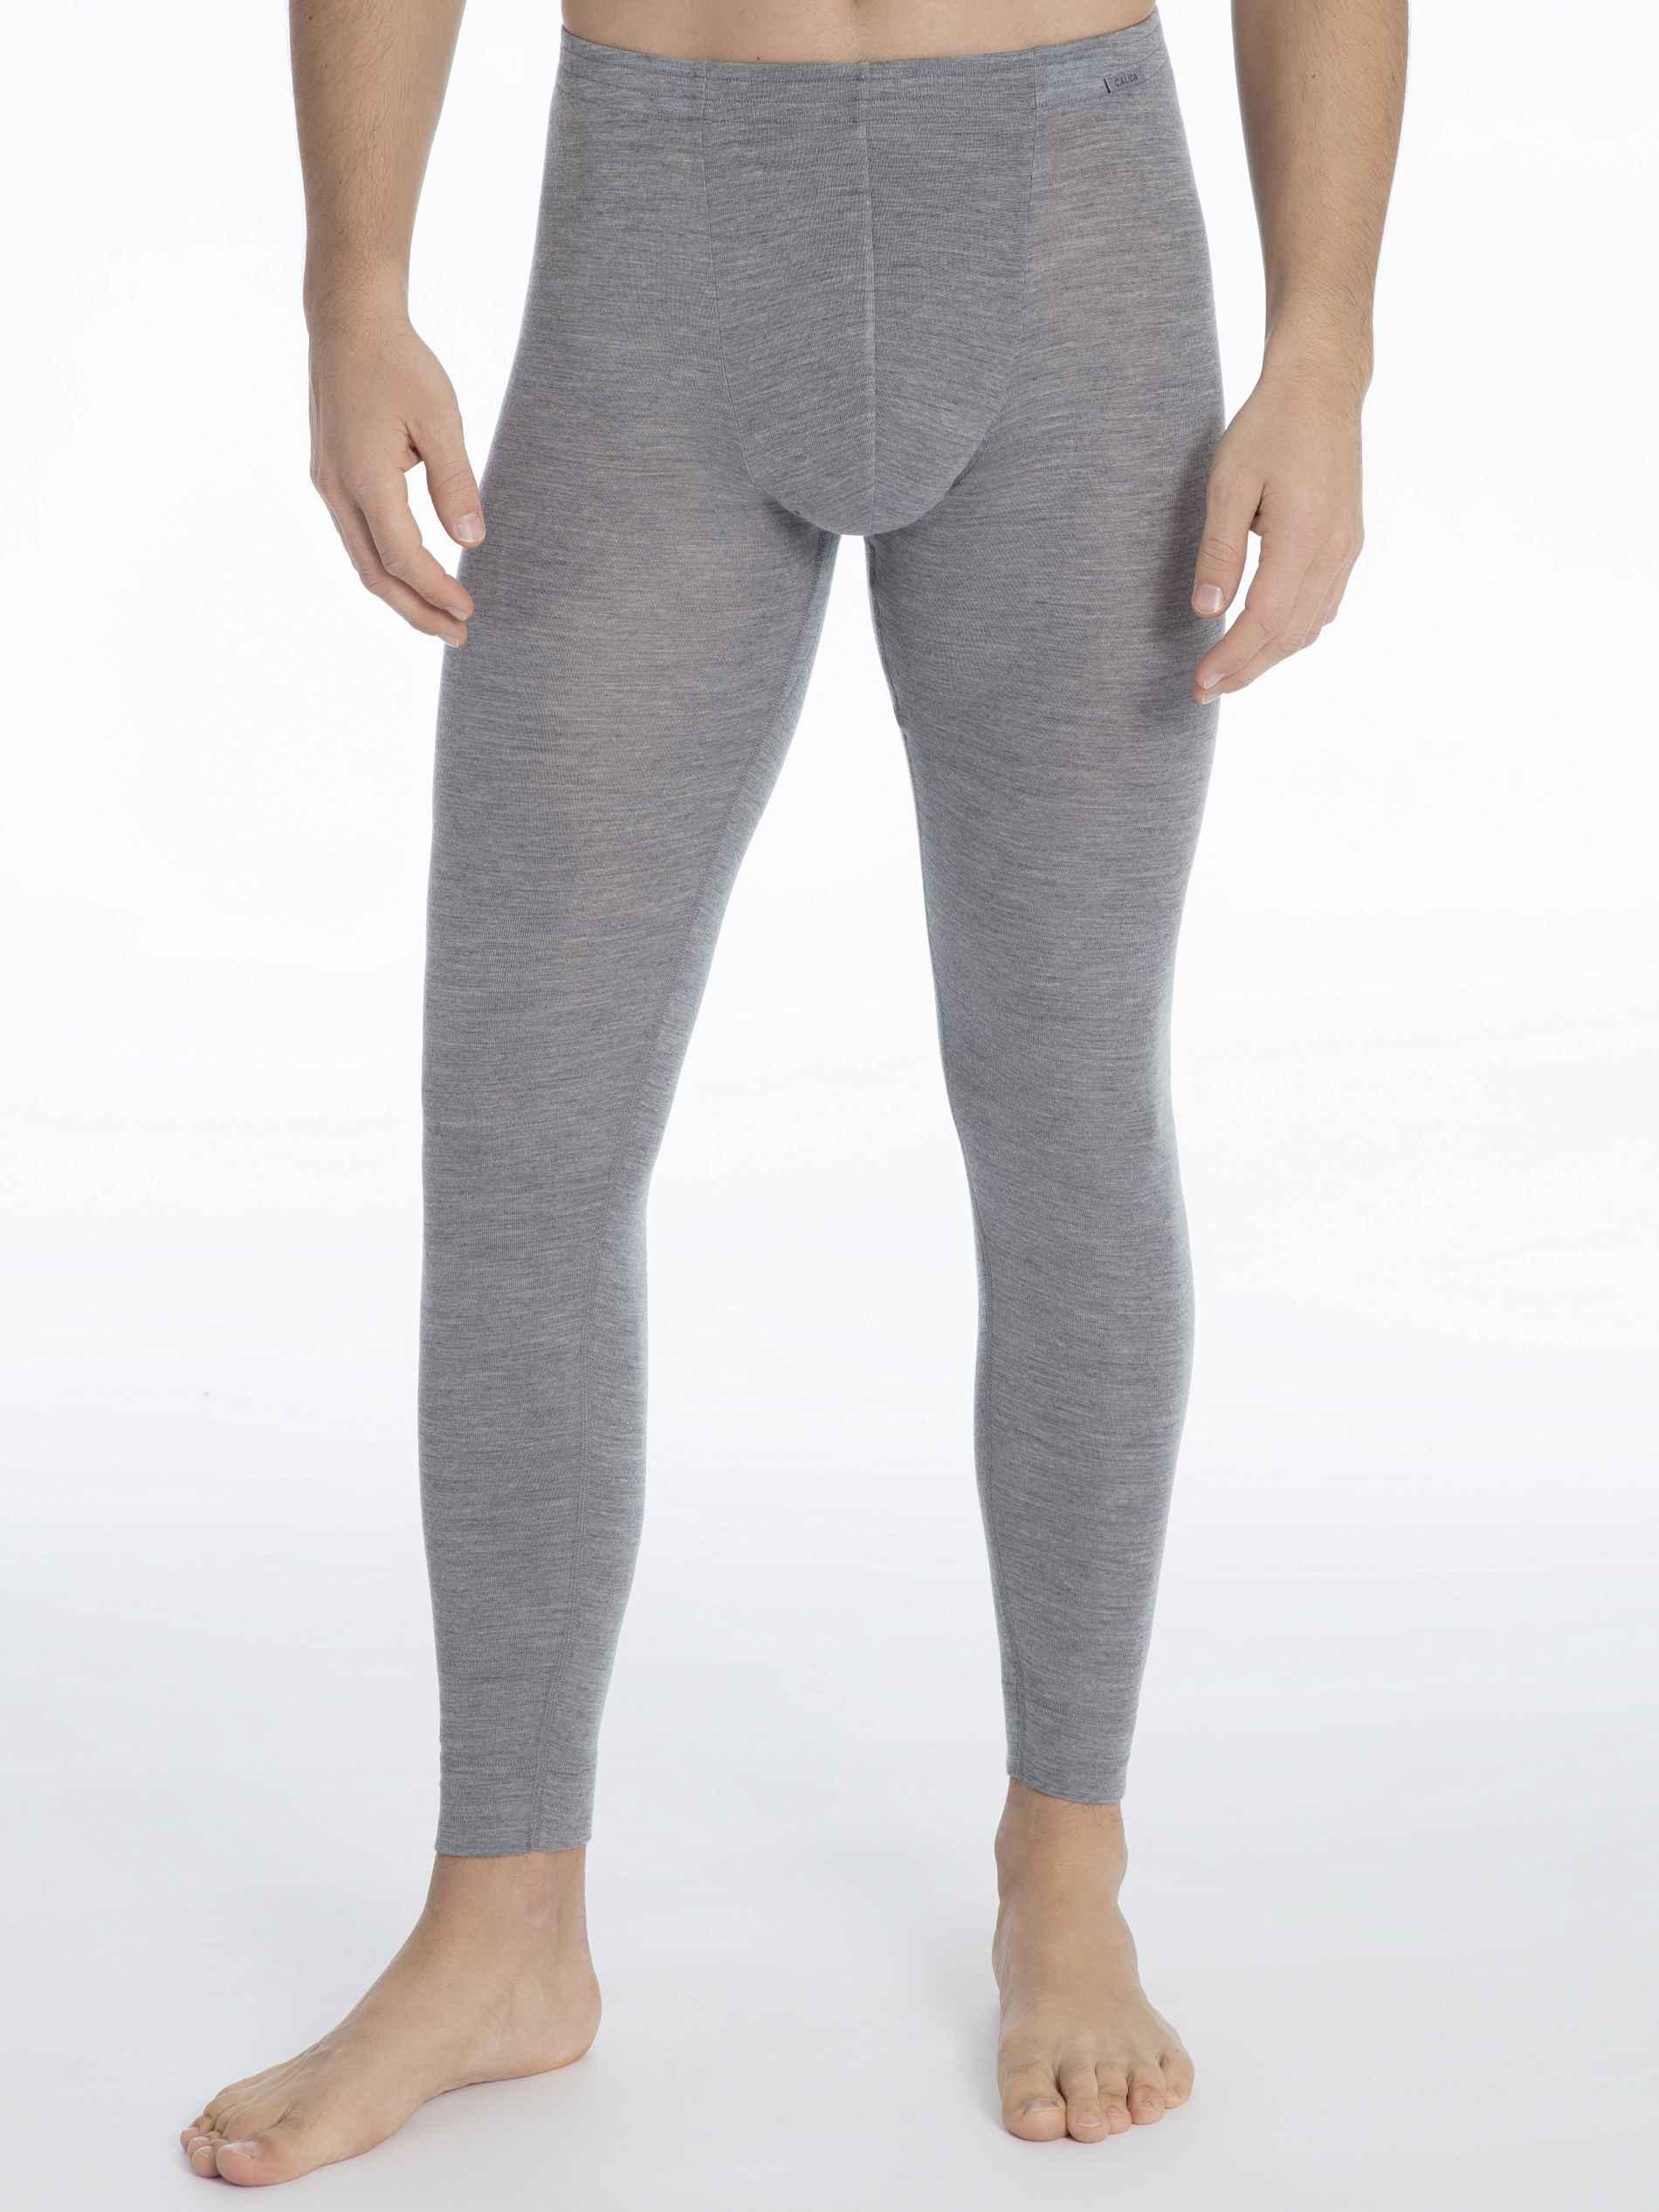 Herren CALIDA Wool & Silk Longpants aus Wolle und Seide grau   07613306426691